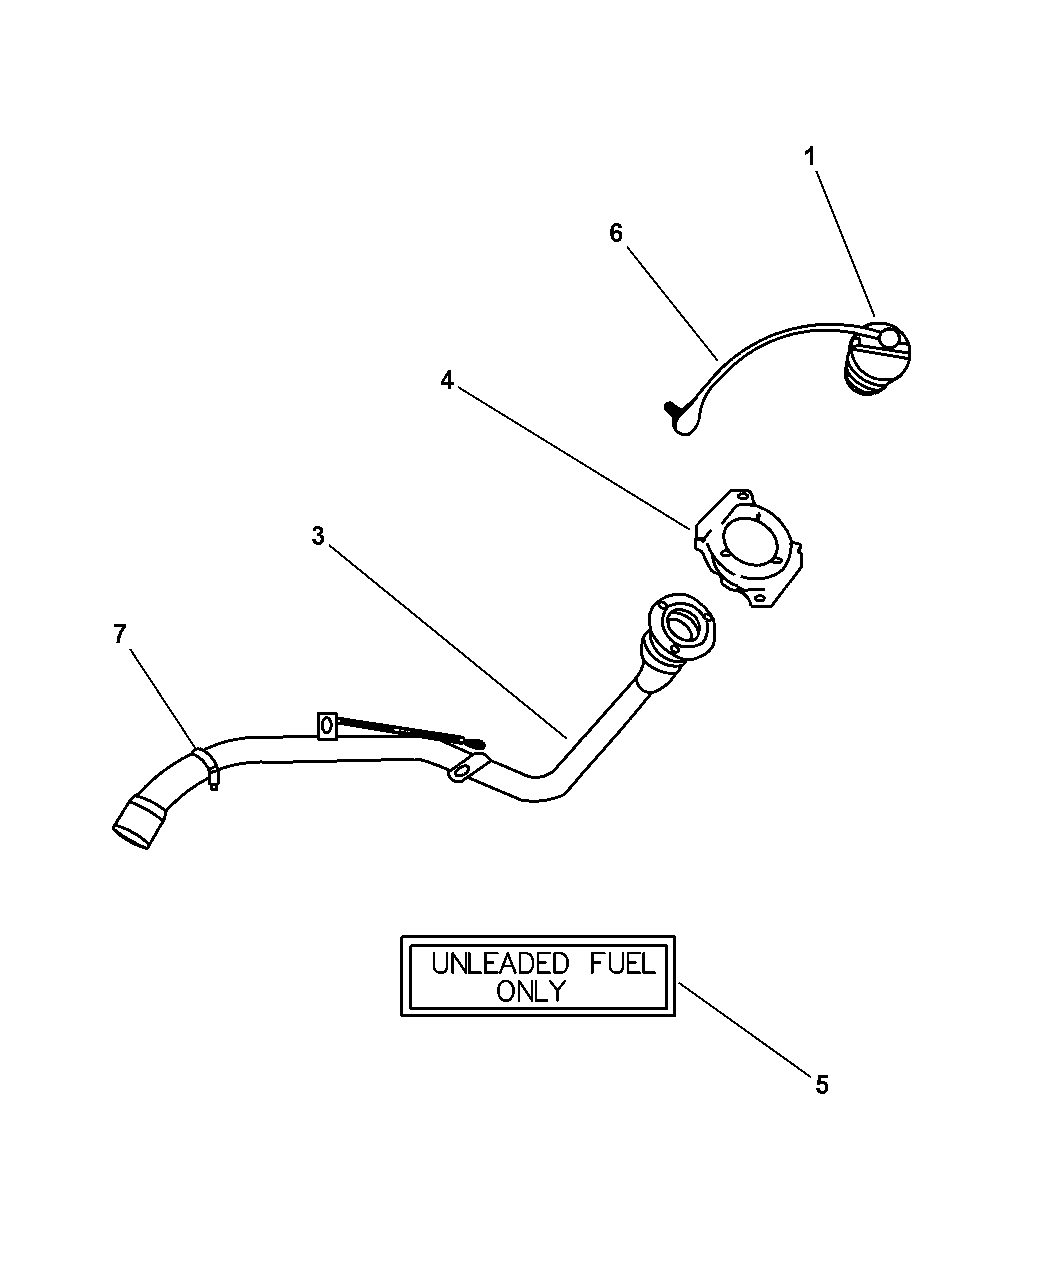 Dodge Stratus Sedan Fuel Tank Filler Tube